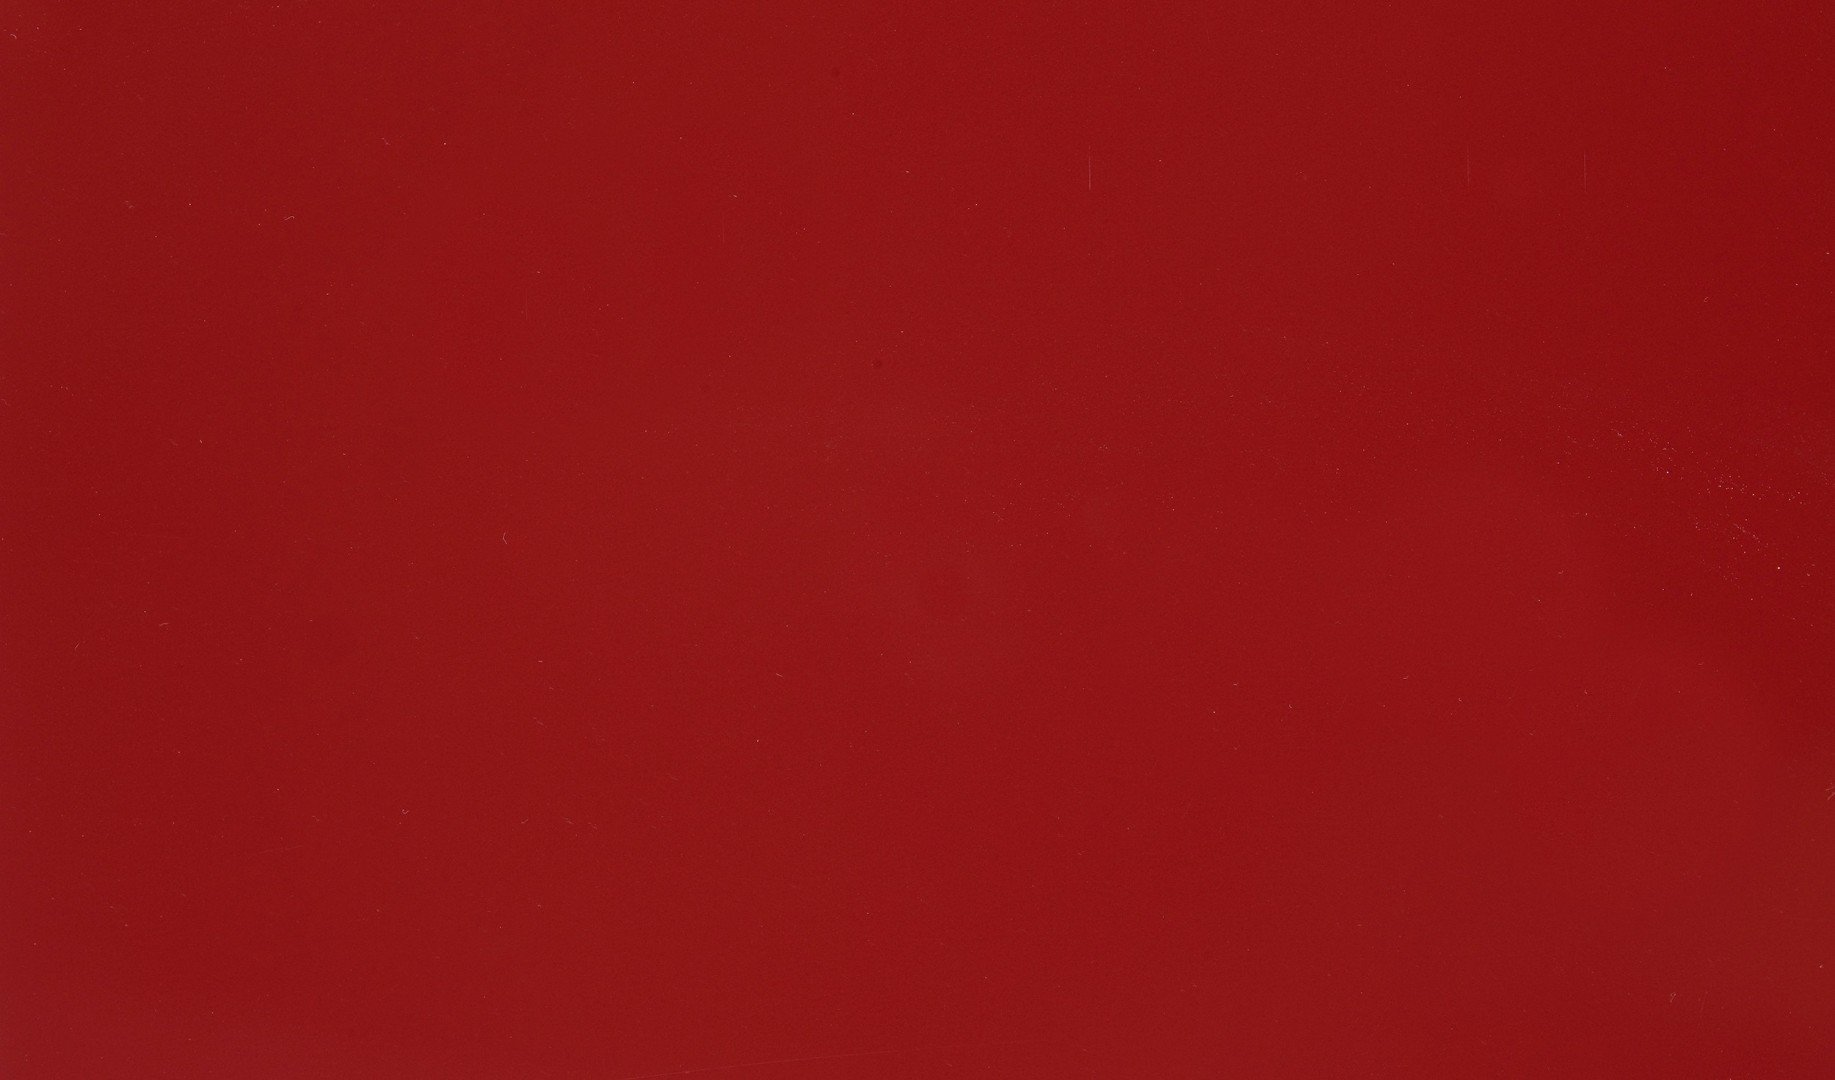 Профнастил НС - 21' стандарт полиэстер двухстороннее 0,45 мм цвет по каталогу RAL 1015, 3005, 5002, 6005, 7024, 8017, 903.